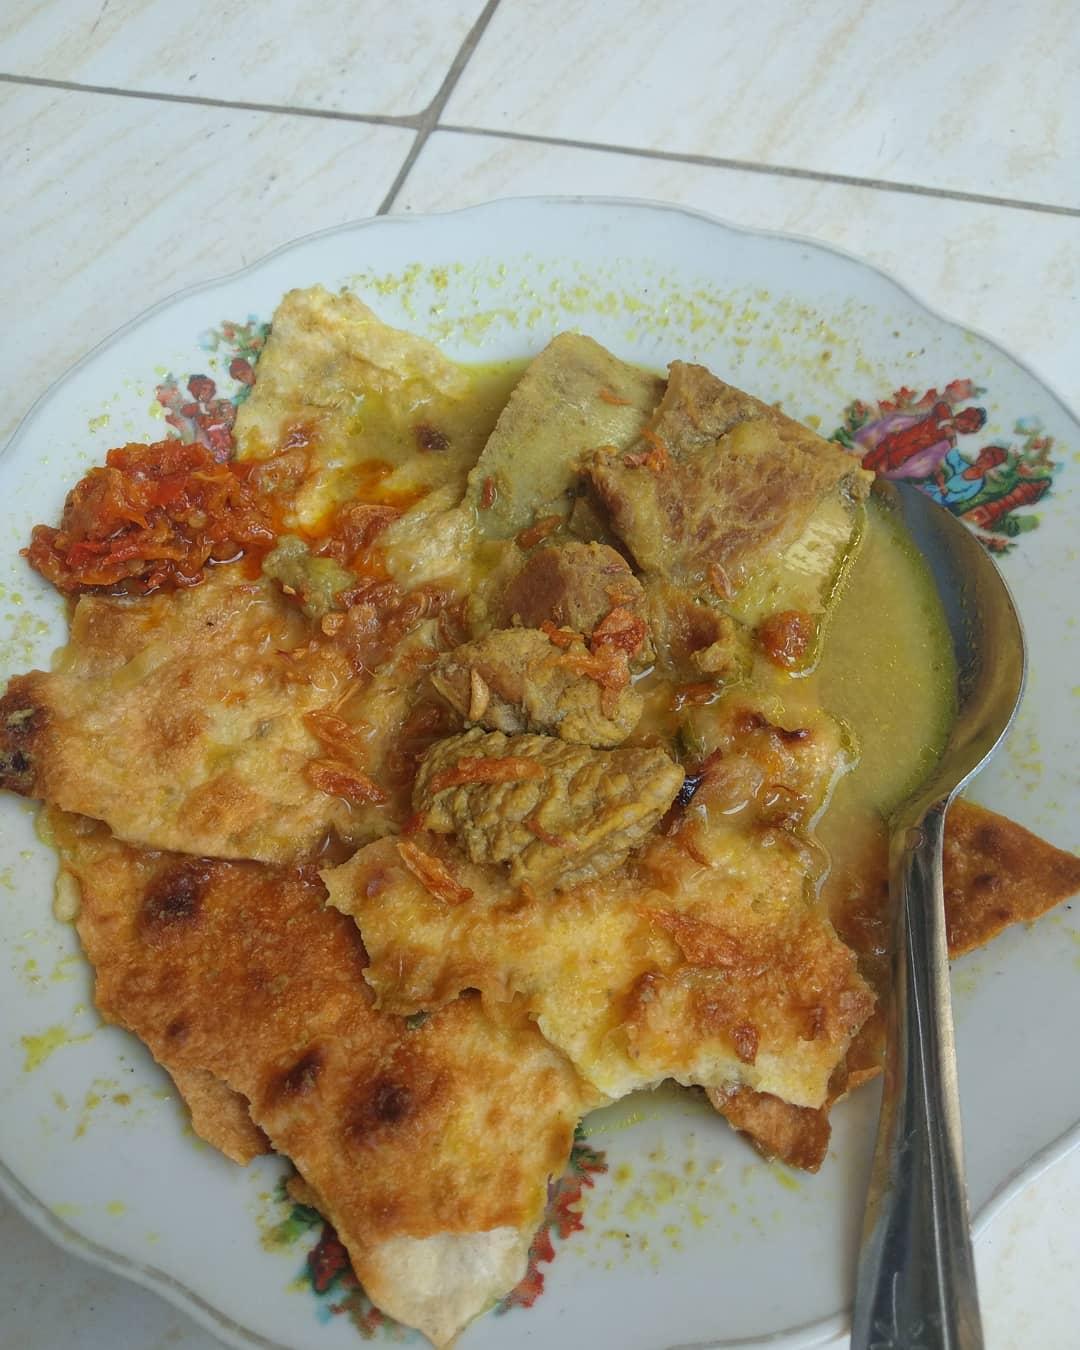 gulai ubus makanan khas gresik